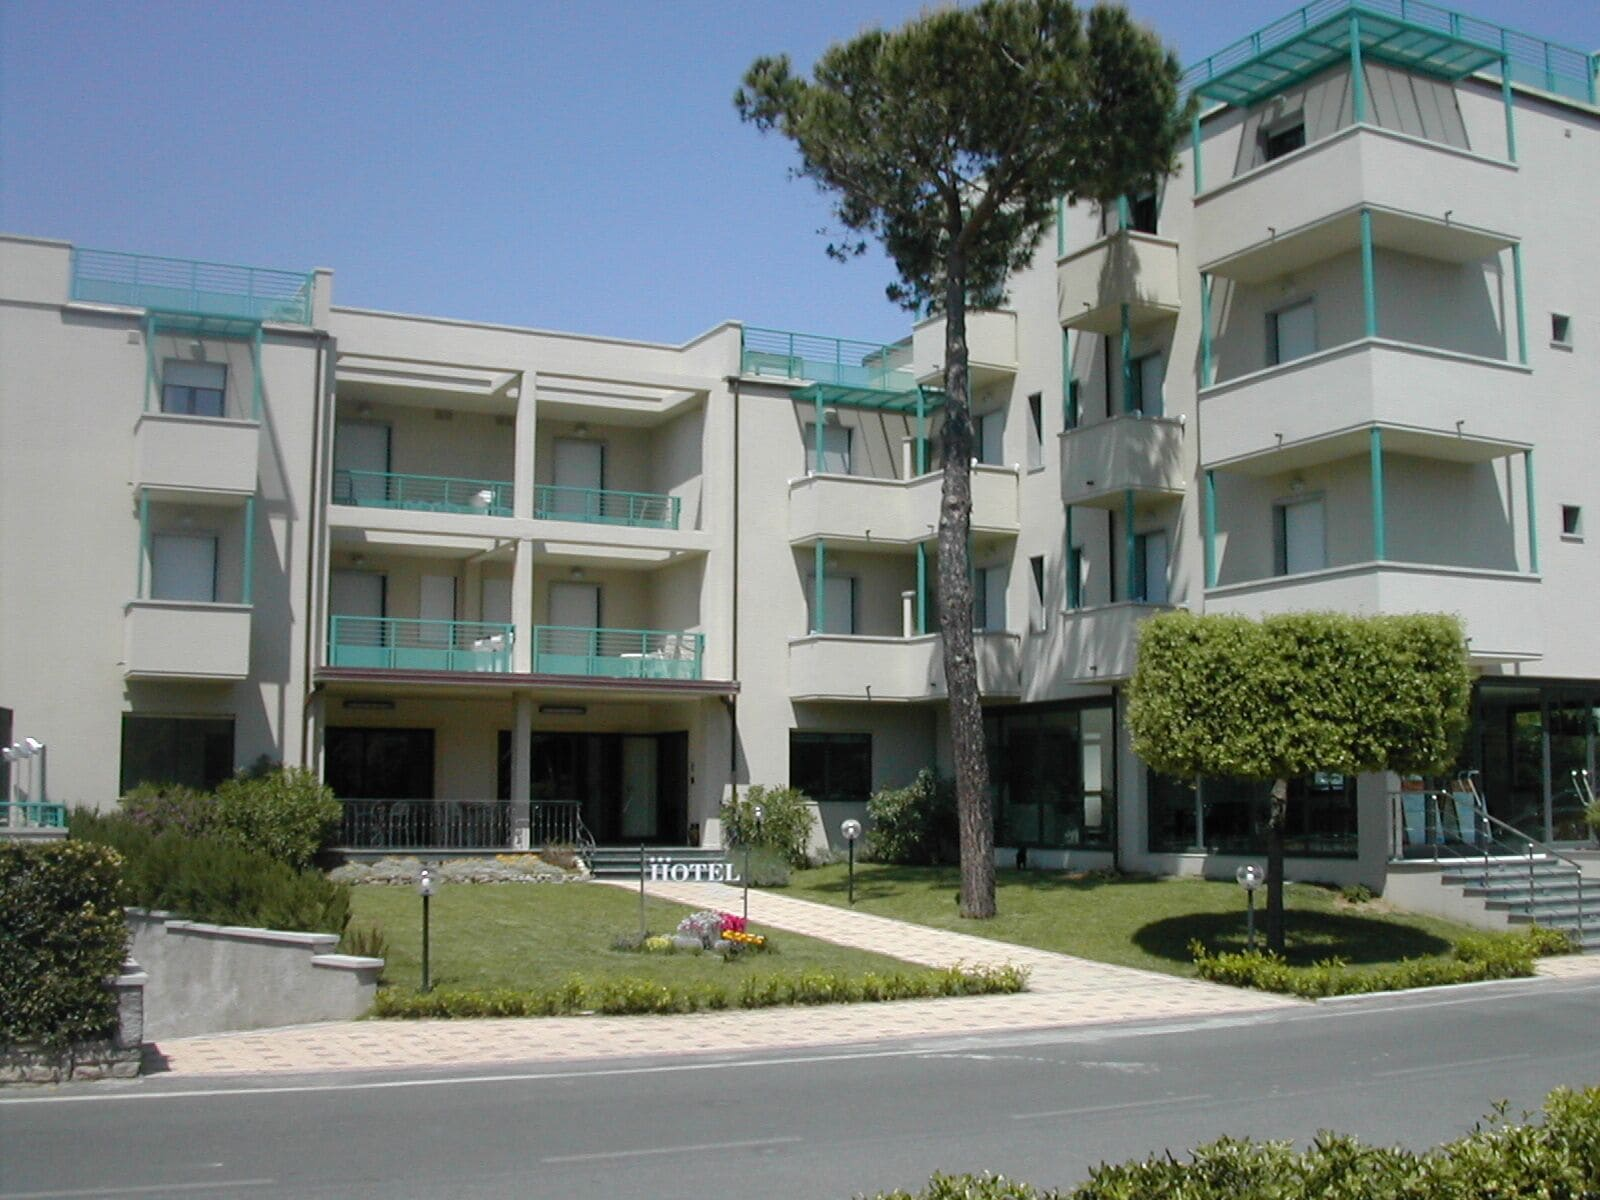 Hotel Flora, Livorno